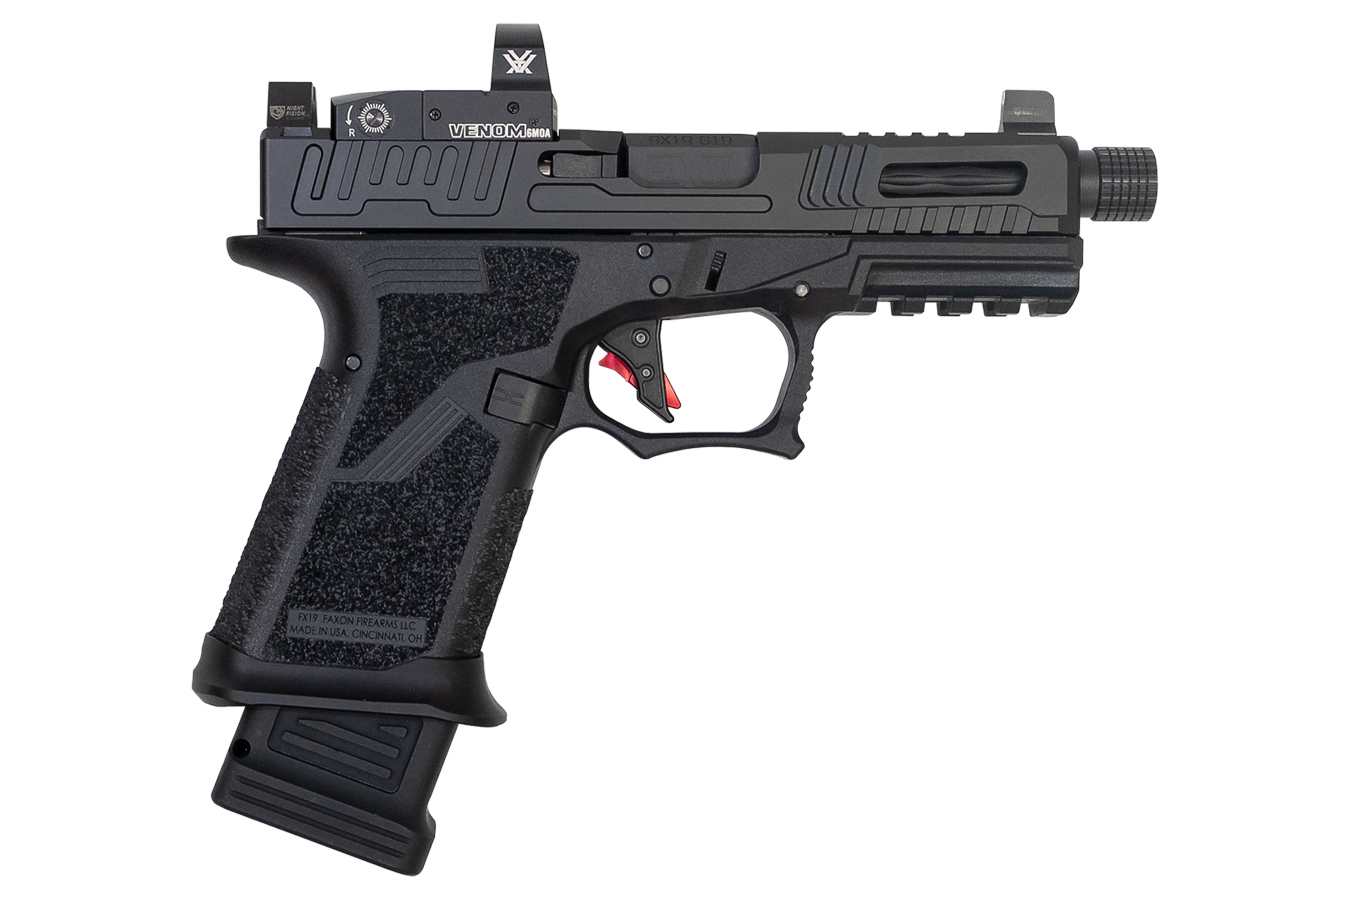 FX19 9mm Hellfire Compact Pistol with Threaded Barrel and Vortex Venom Optic